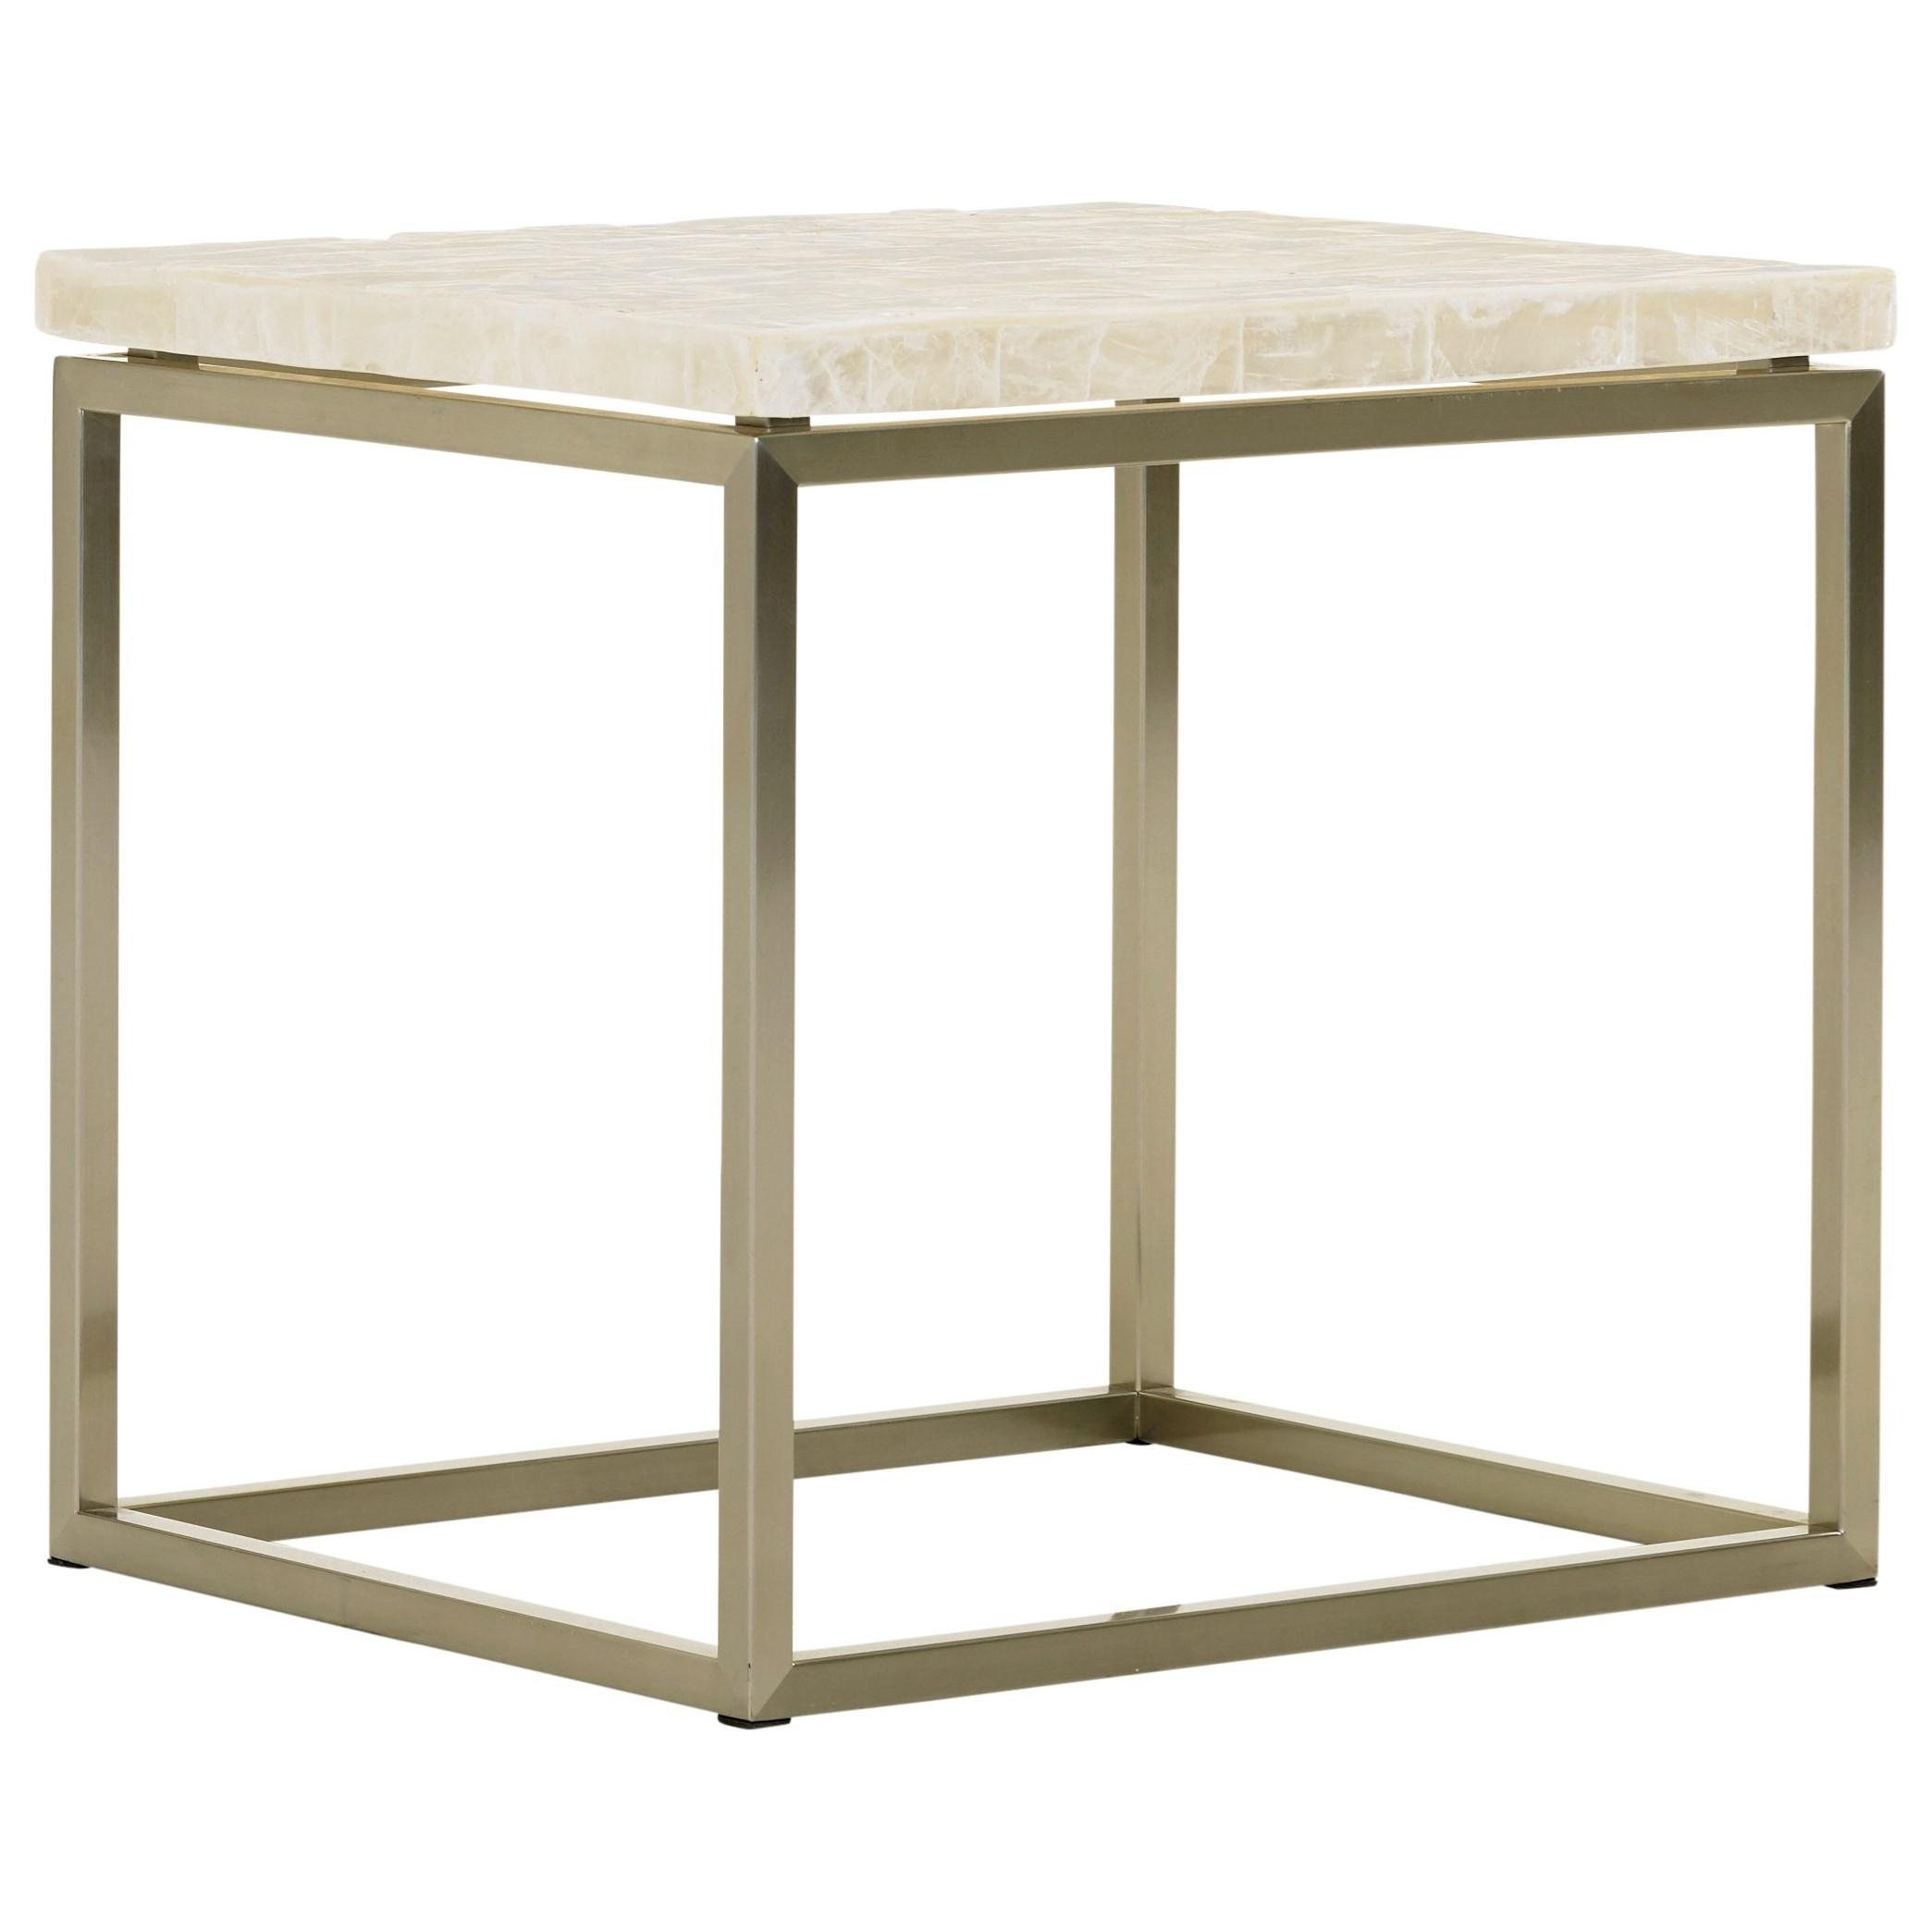 MacArthur Park Marisol End Table by Lexington at Baer's Furniture